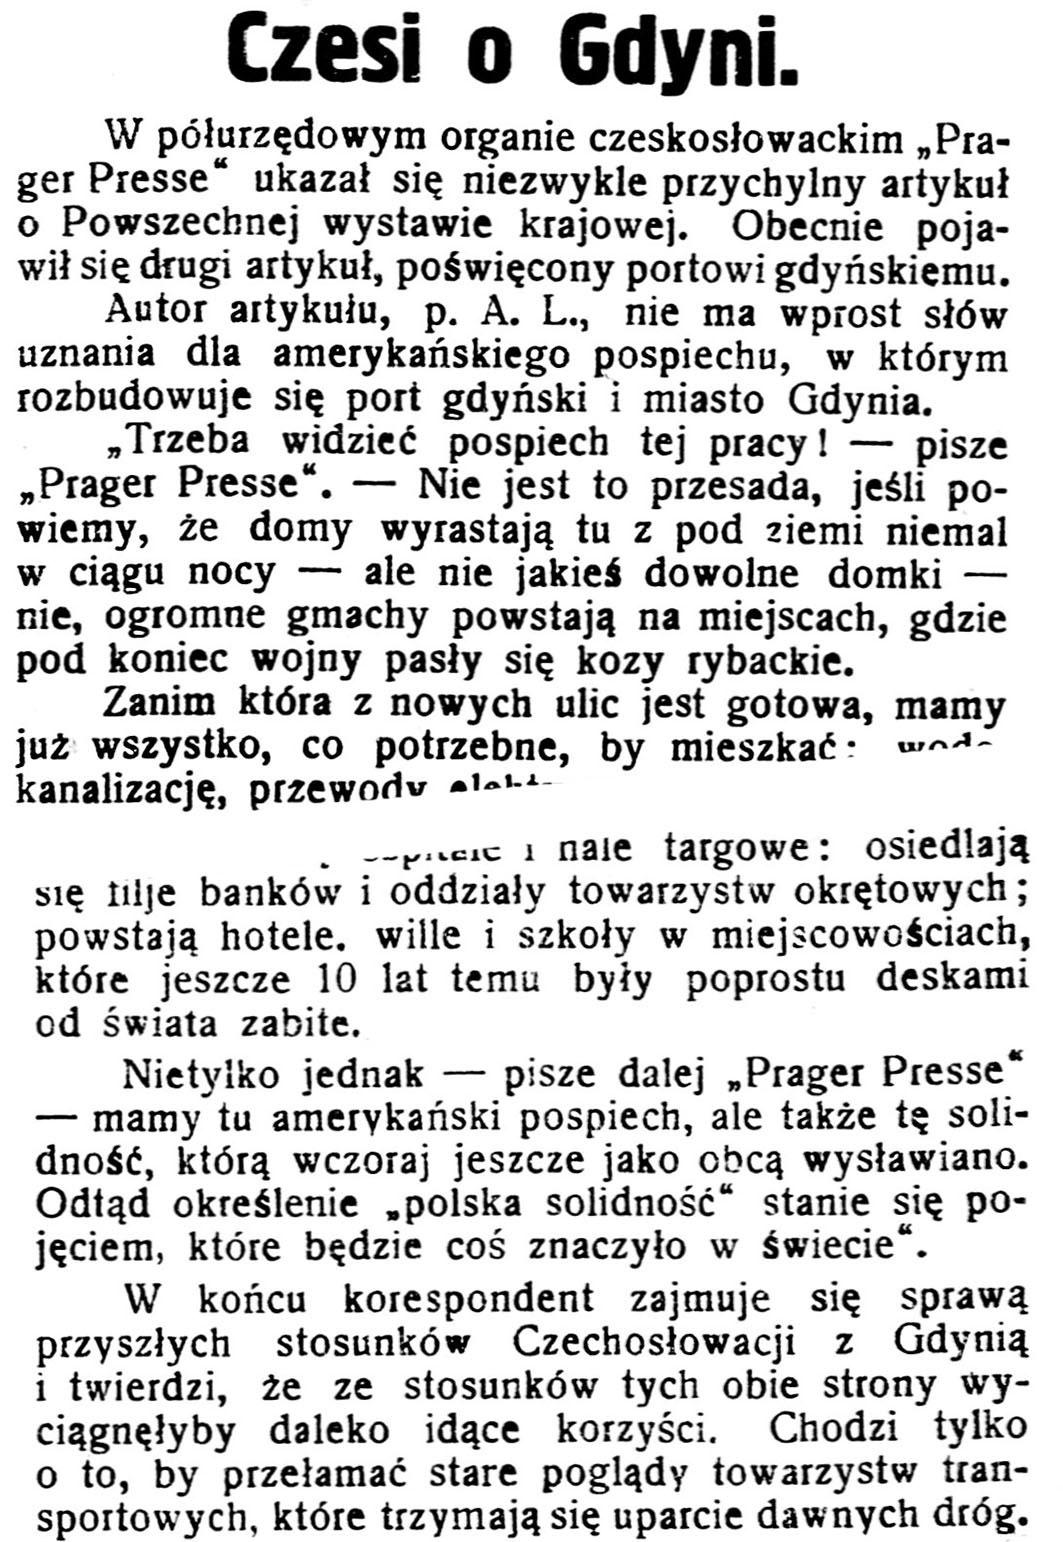 Czesi o Gdyni // Gazeta Kartuska. - 1929, nr 115, s. 1